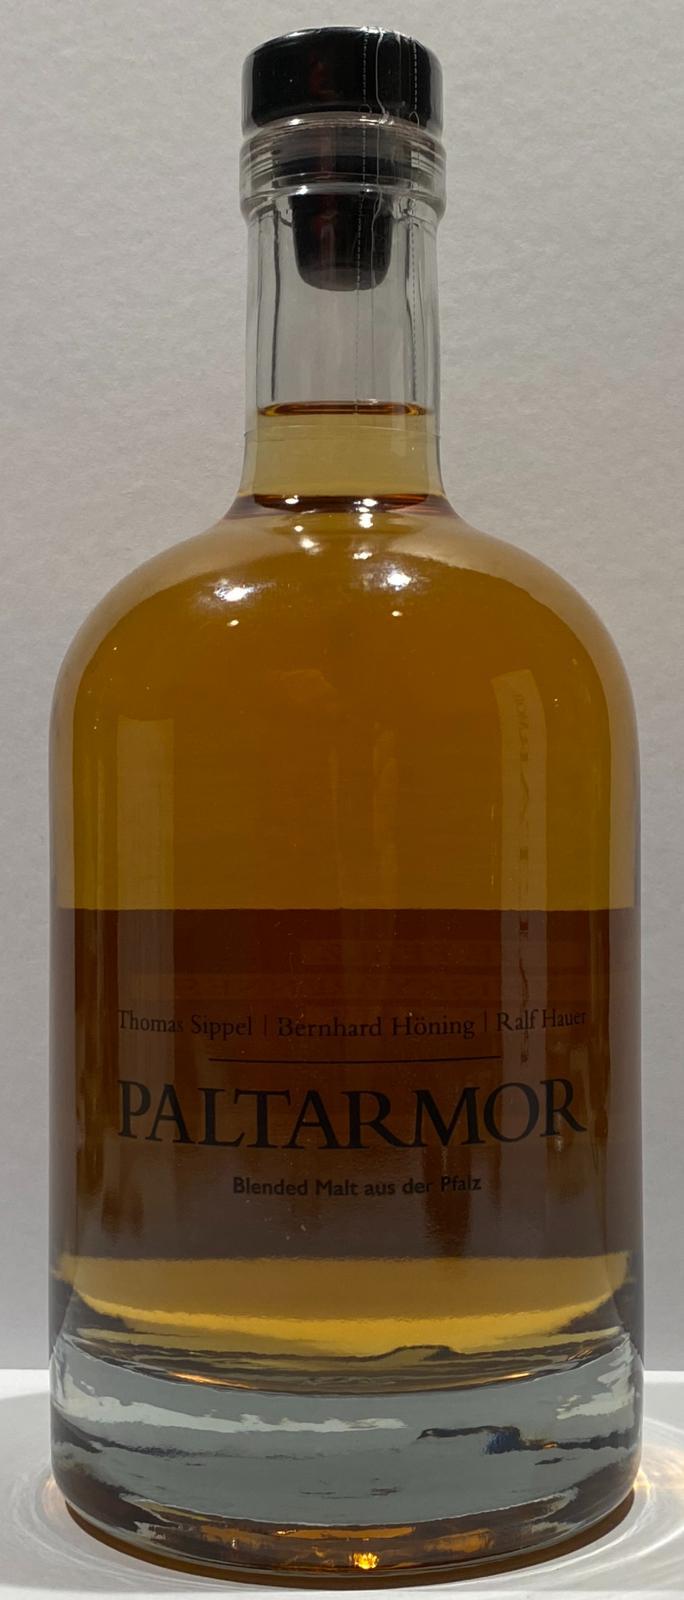 Paltarmor 05-year-old